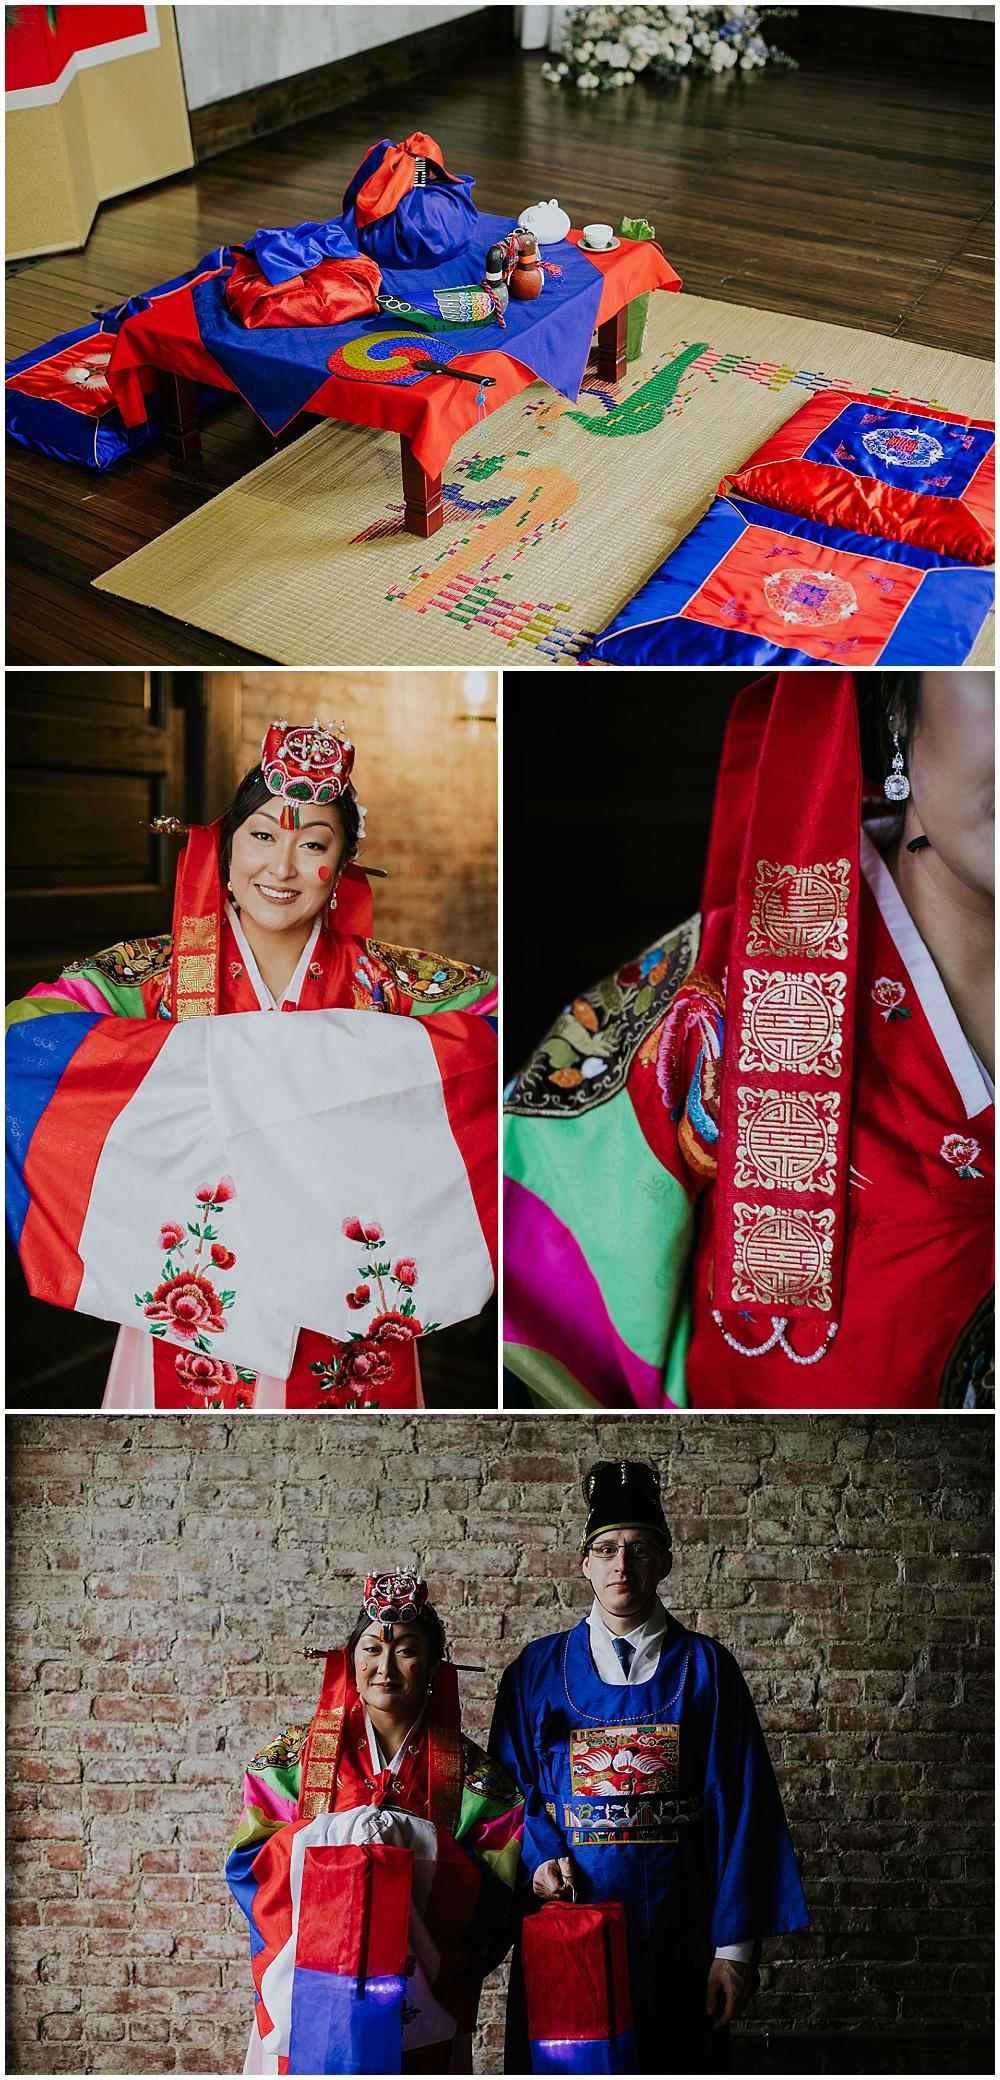 Korean ceremony details and Bride and Groom Korean wedding attire | Korean-American intimate multicultural wedding in Neidhammer coffee shop